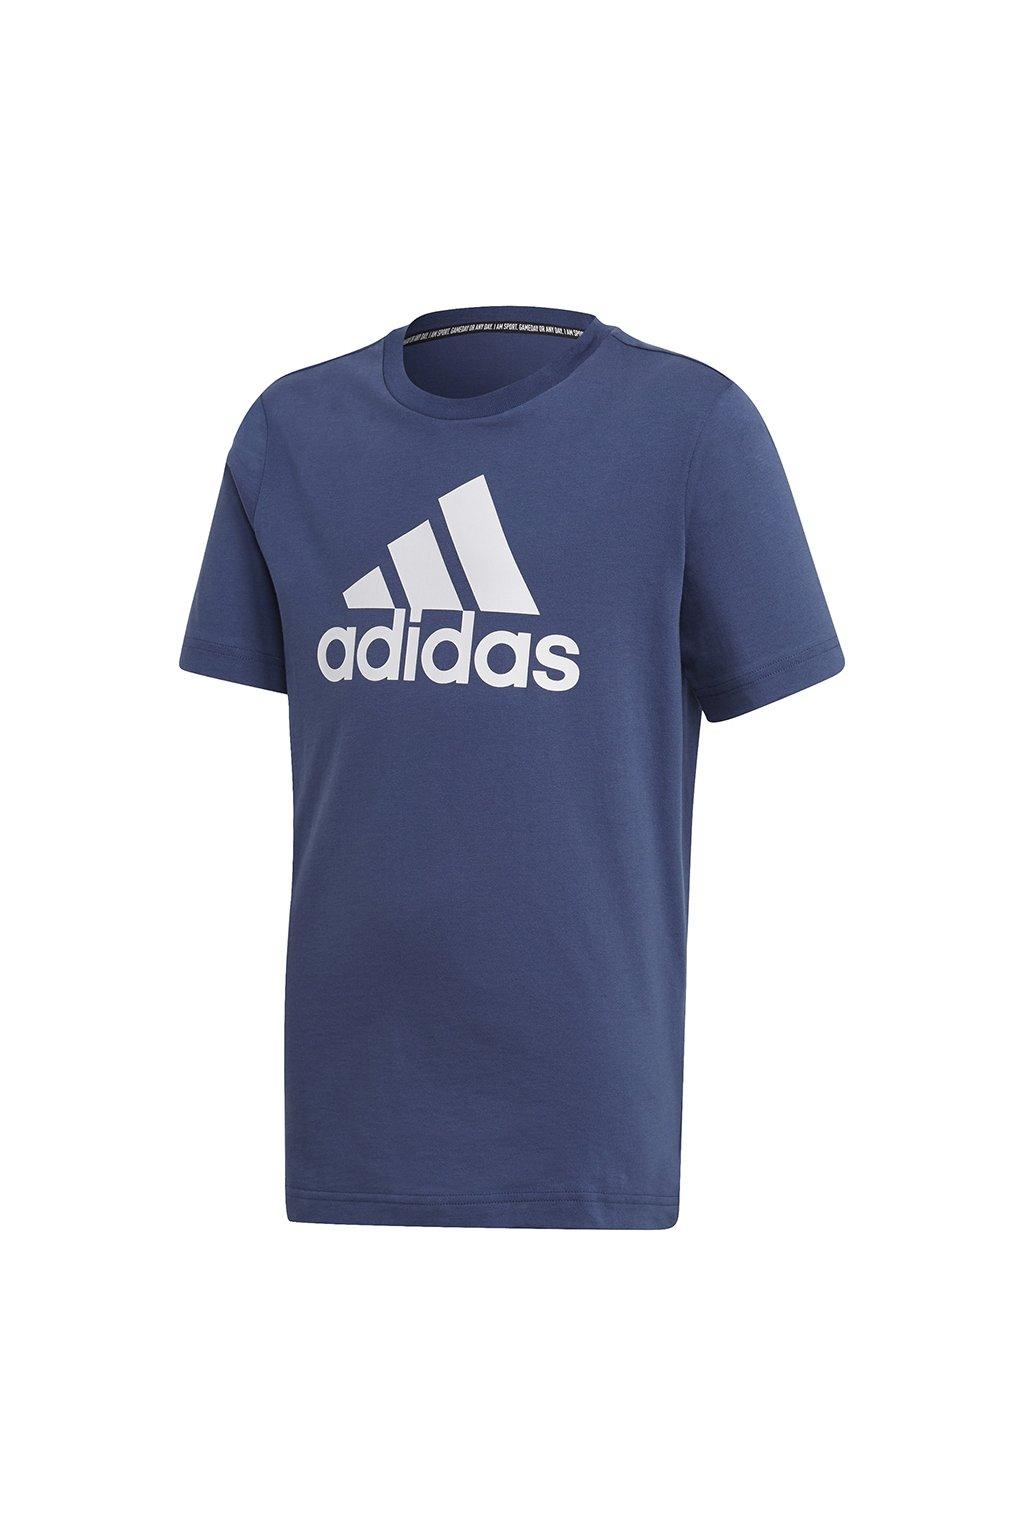 Chlapčenské tričko Adidas YB MH Bos Tee tmavo modré FM6452